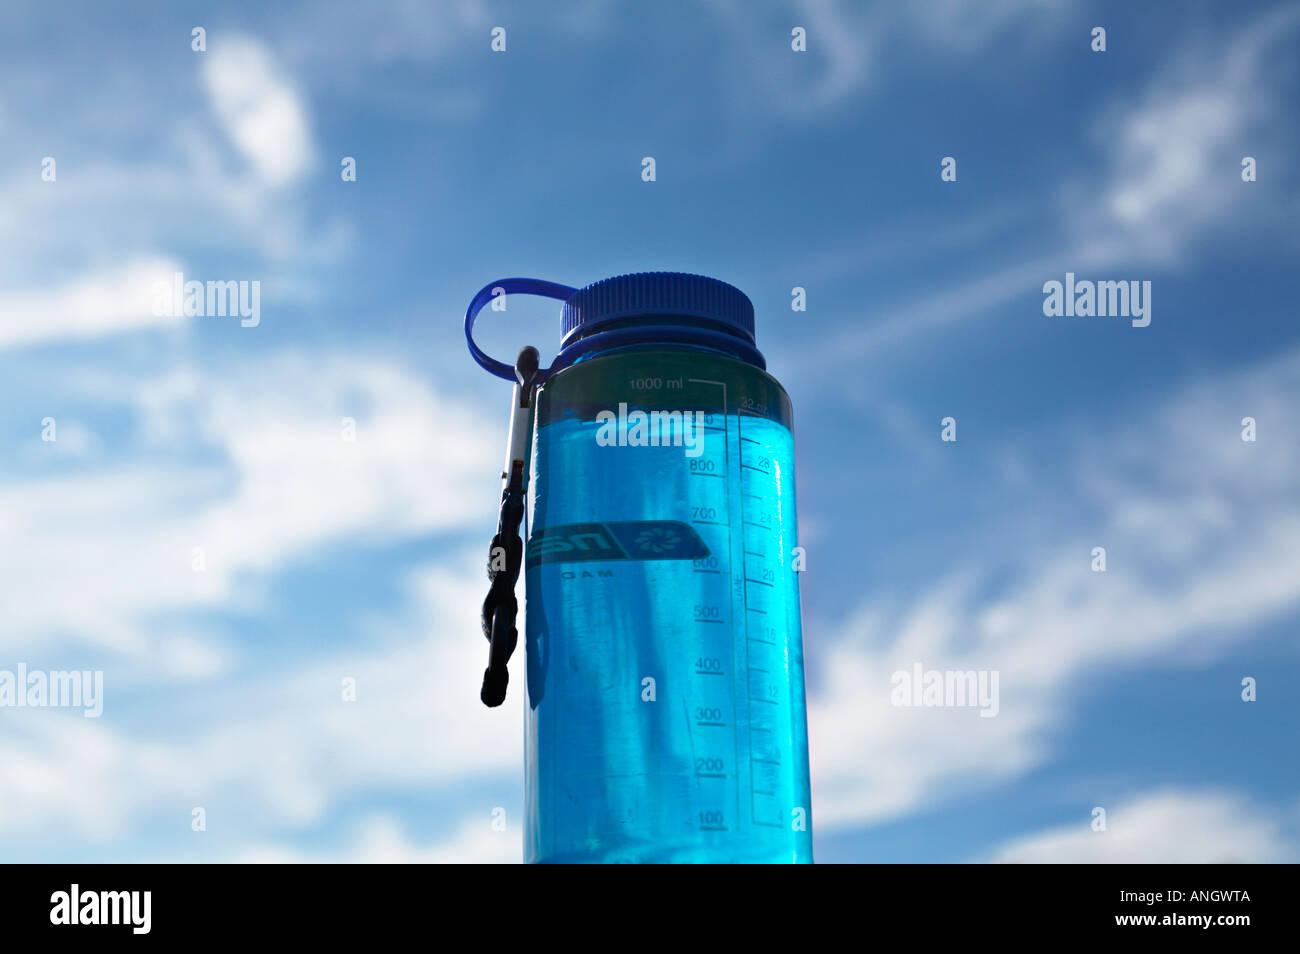 Screw Top Lid Stock Photos & Screw Top Lid Stock Images - Alamy